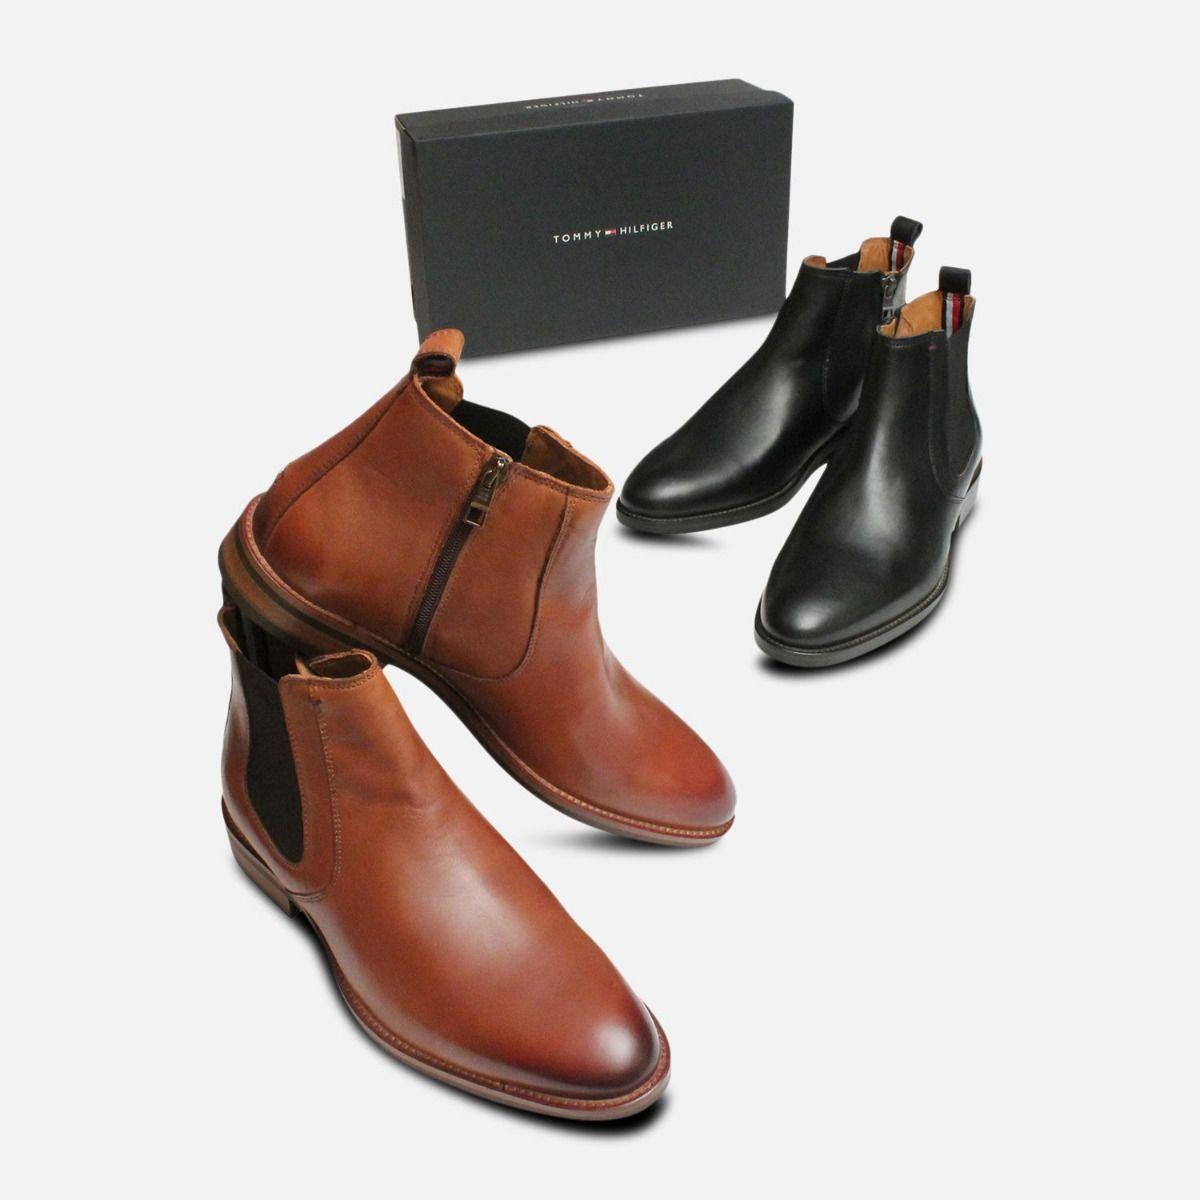 ddbd00bfd Black Tommy Hilfiger Daytona Dress Chelsea Boots